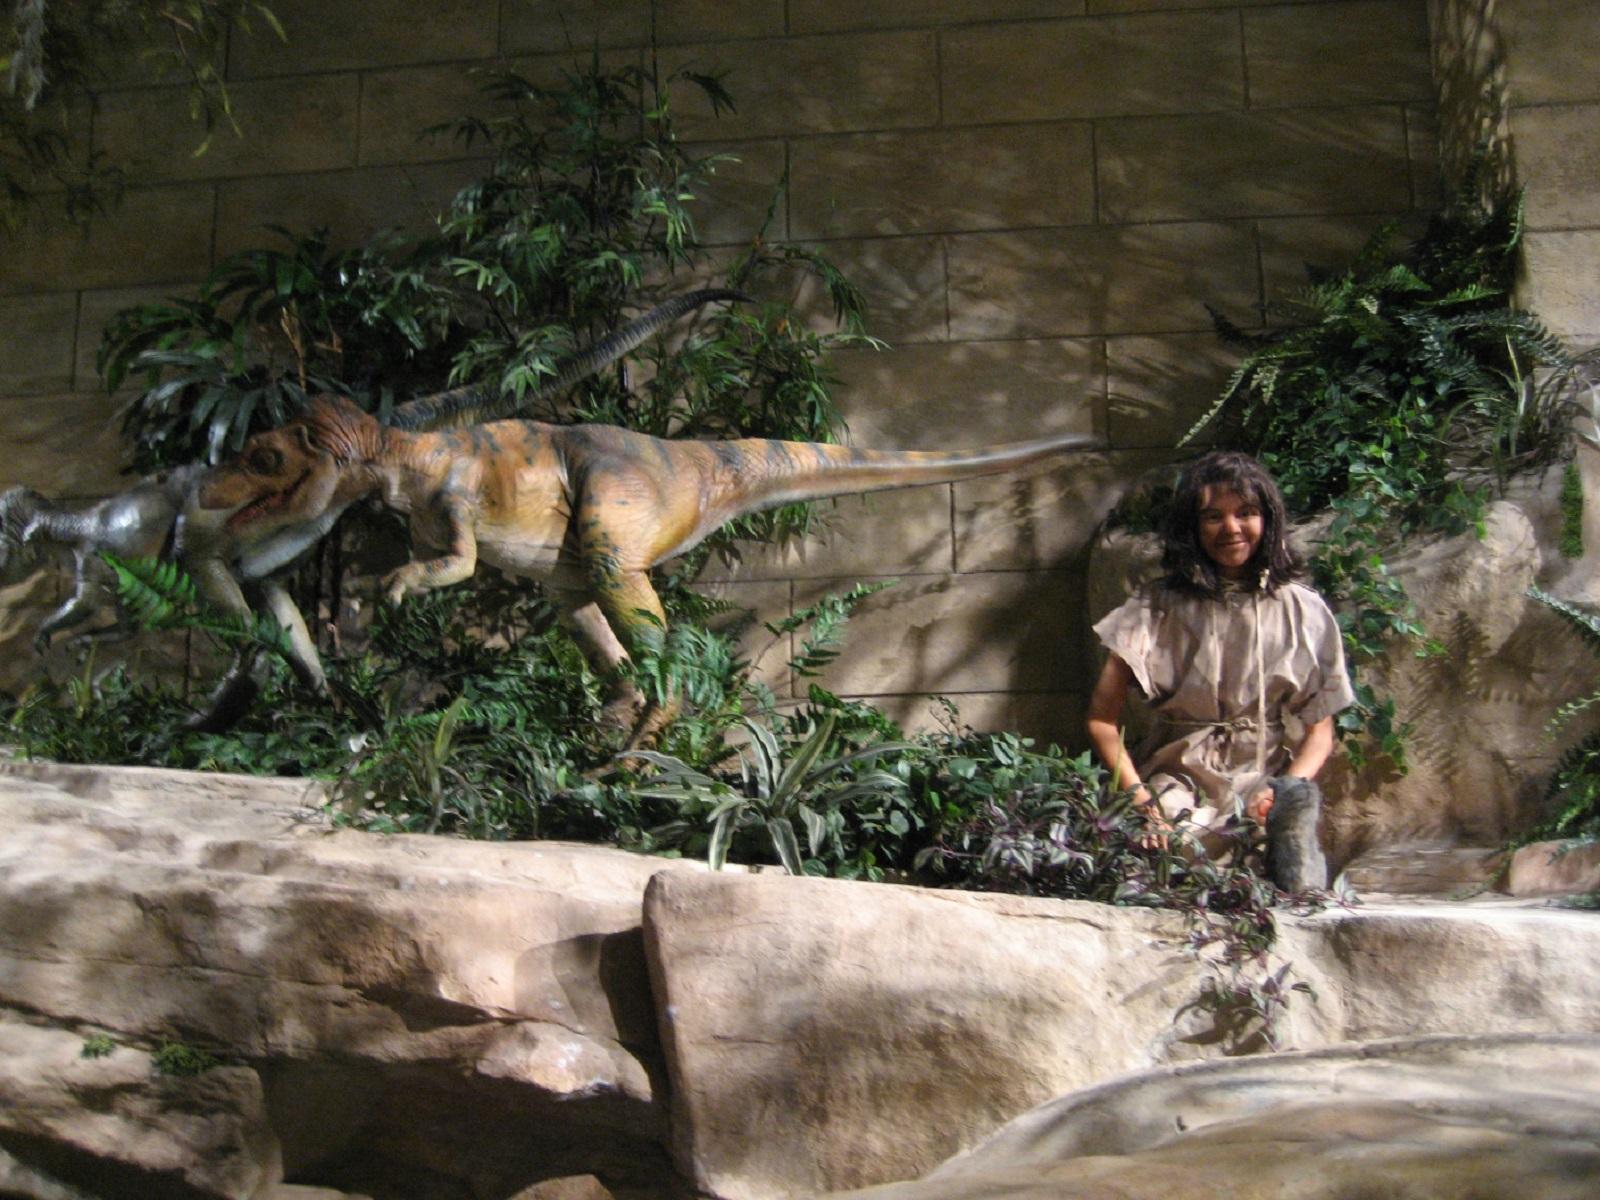 Creationist museum piece